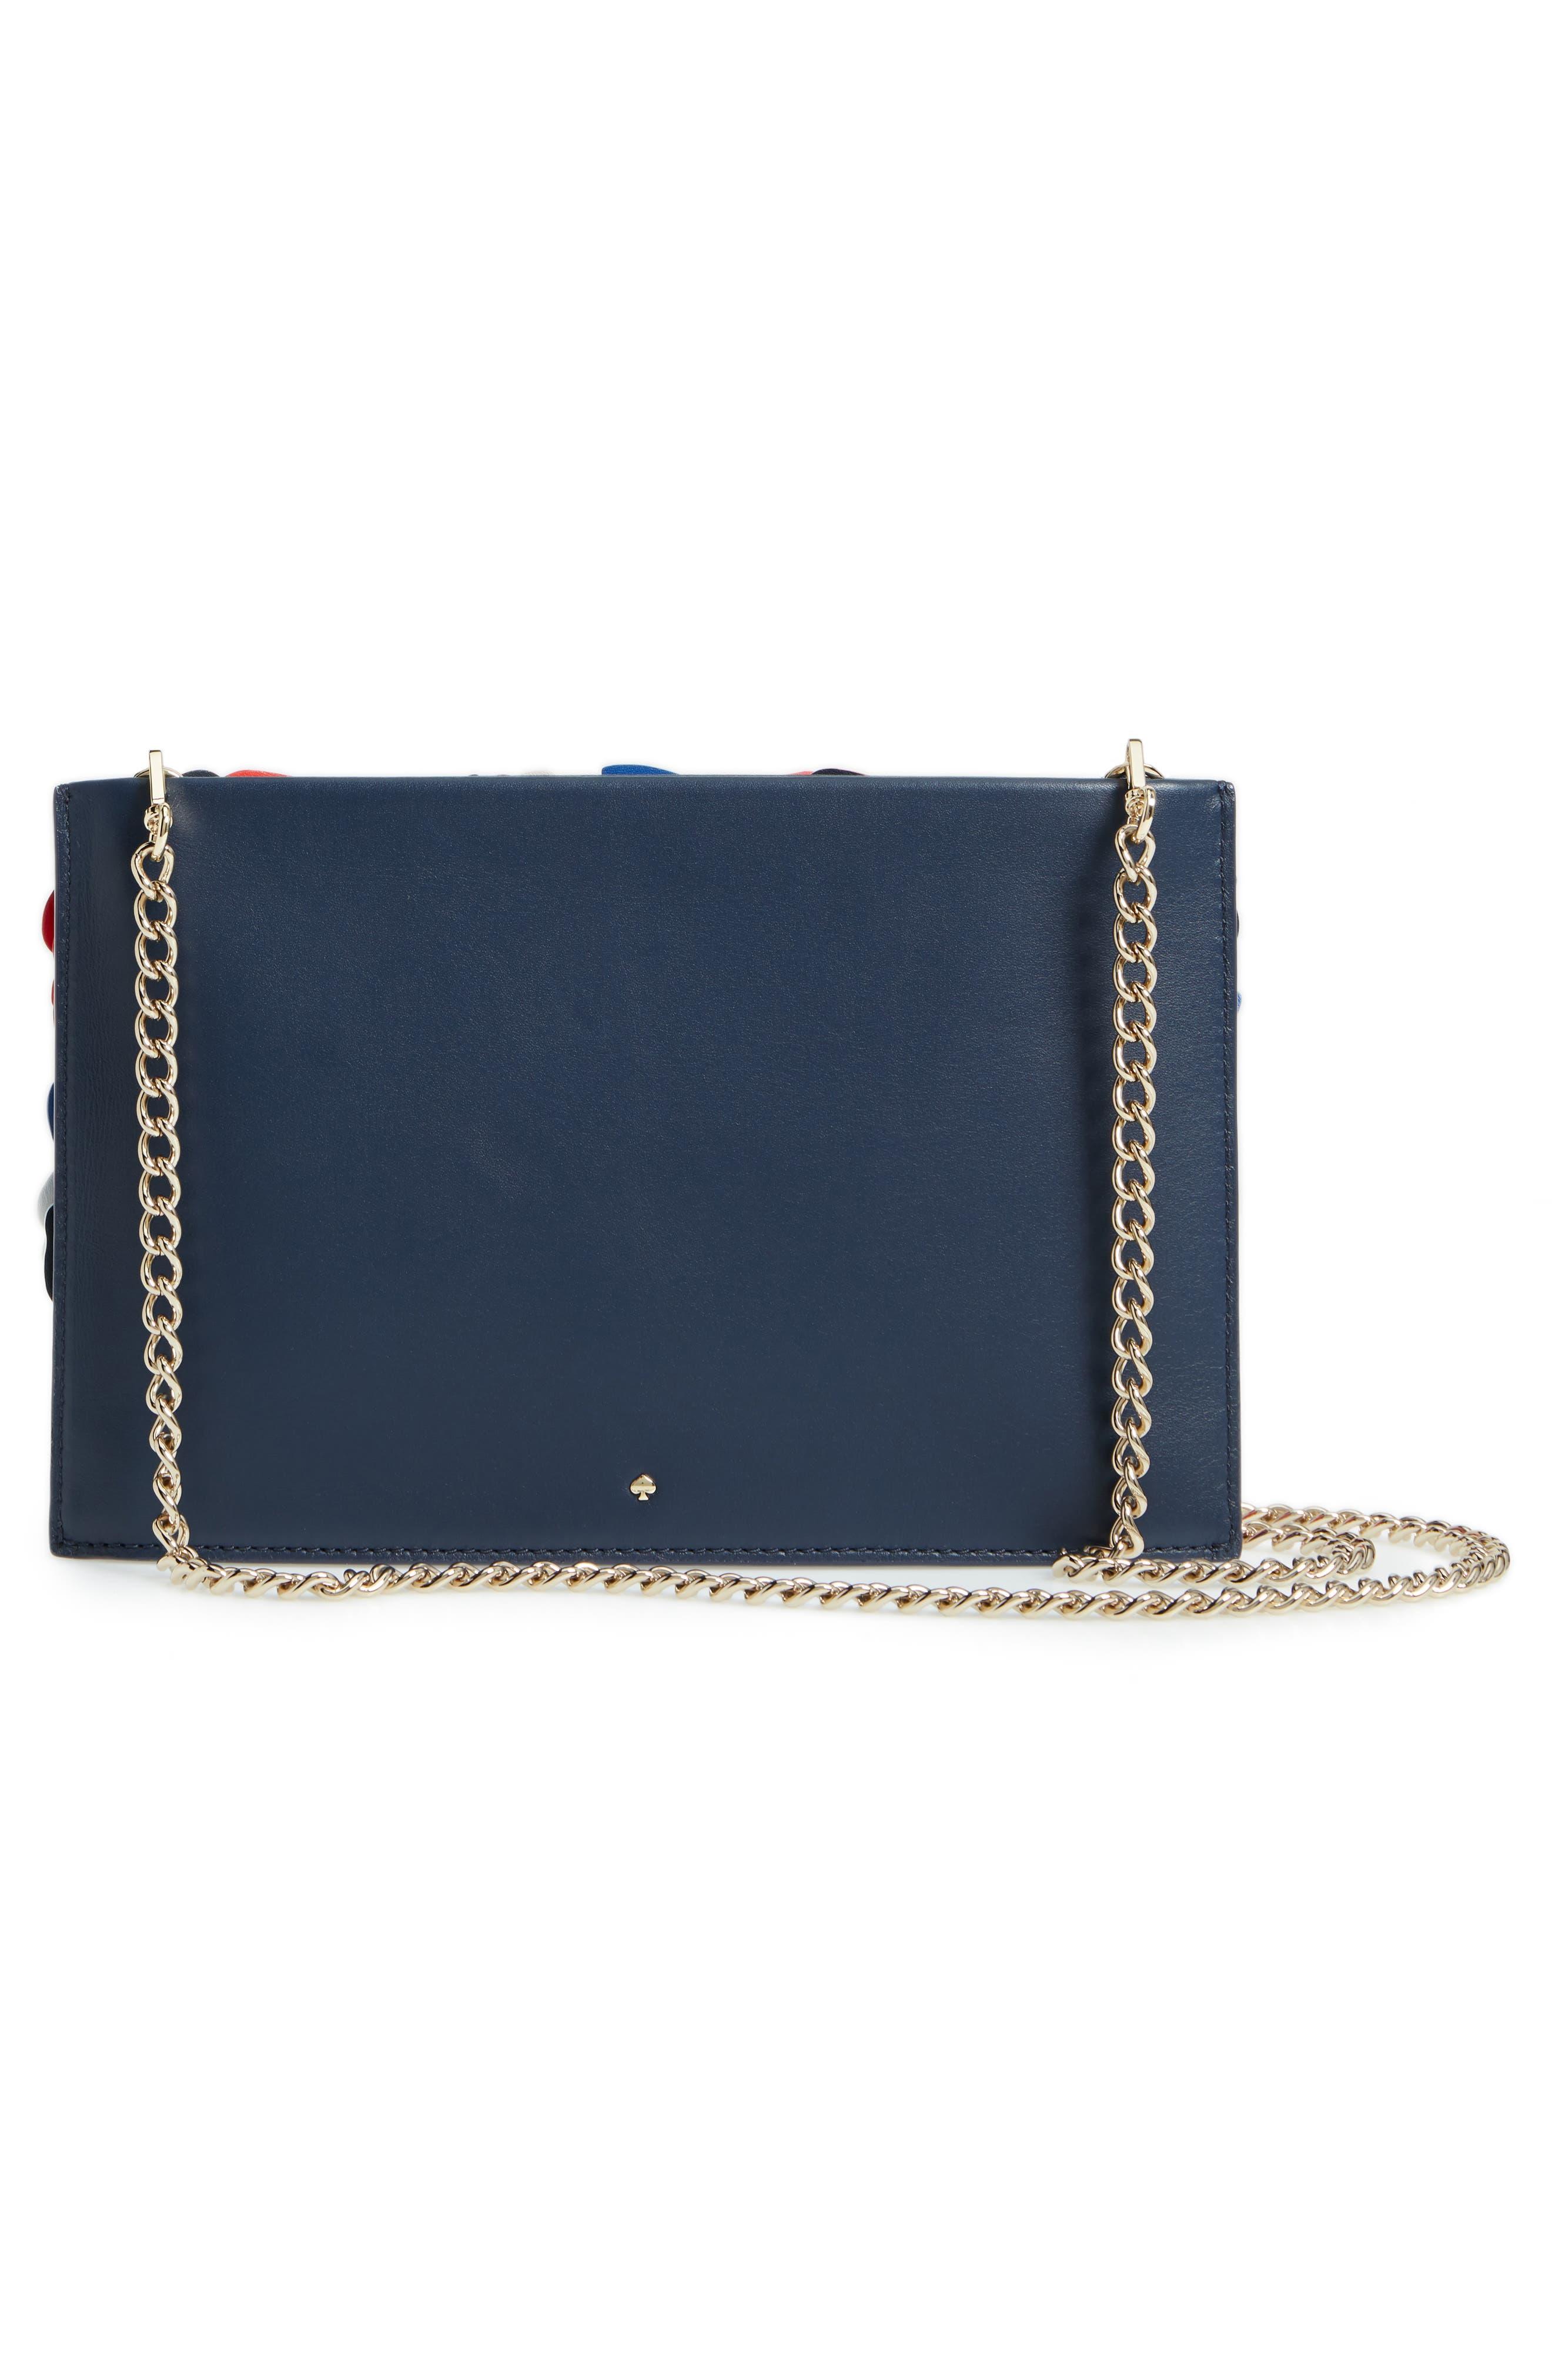 madison daisy lane - sima leather crossbody bag,                             Alternate thumbnail 3, color,                             Blazer Blue Multi